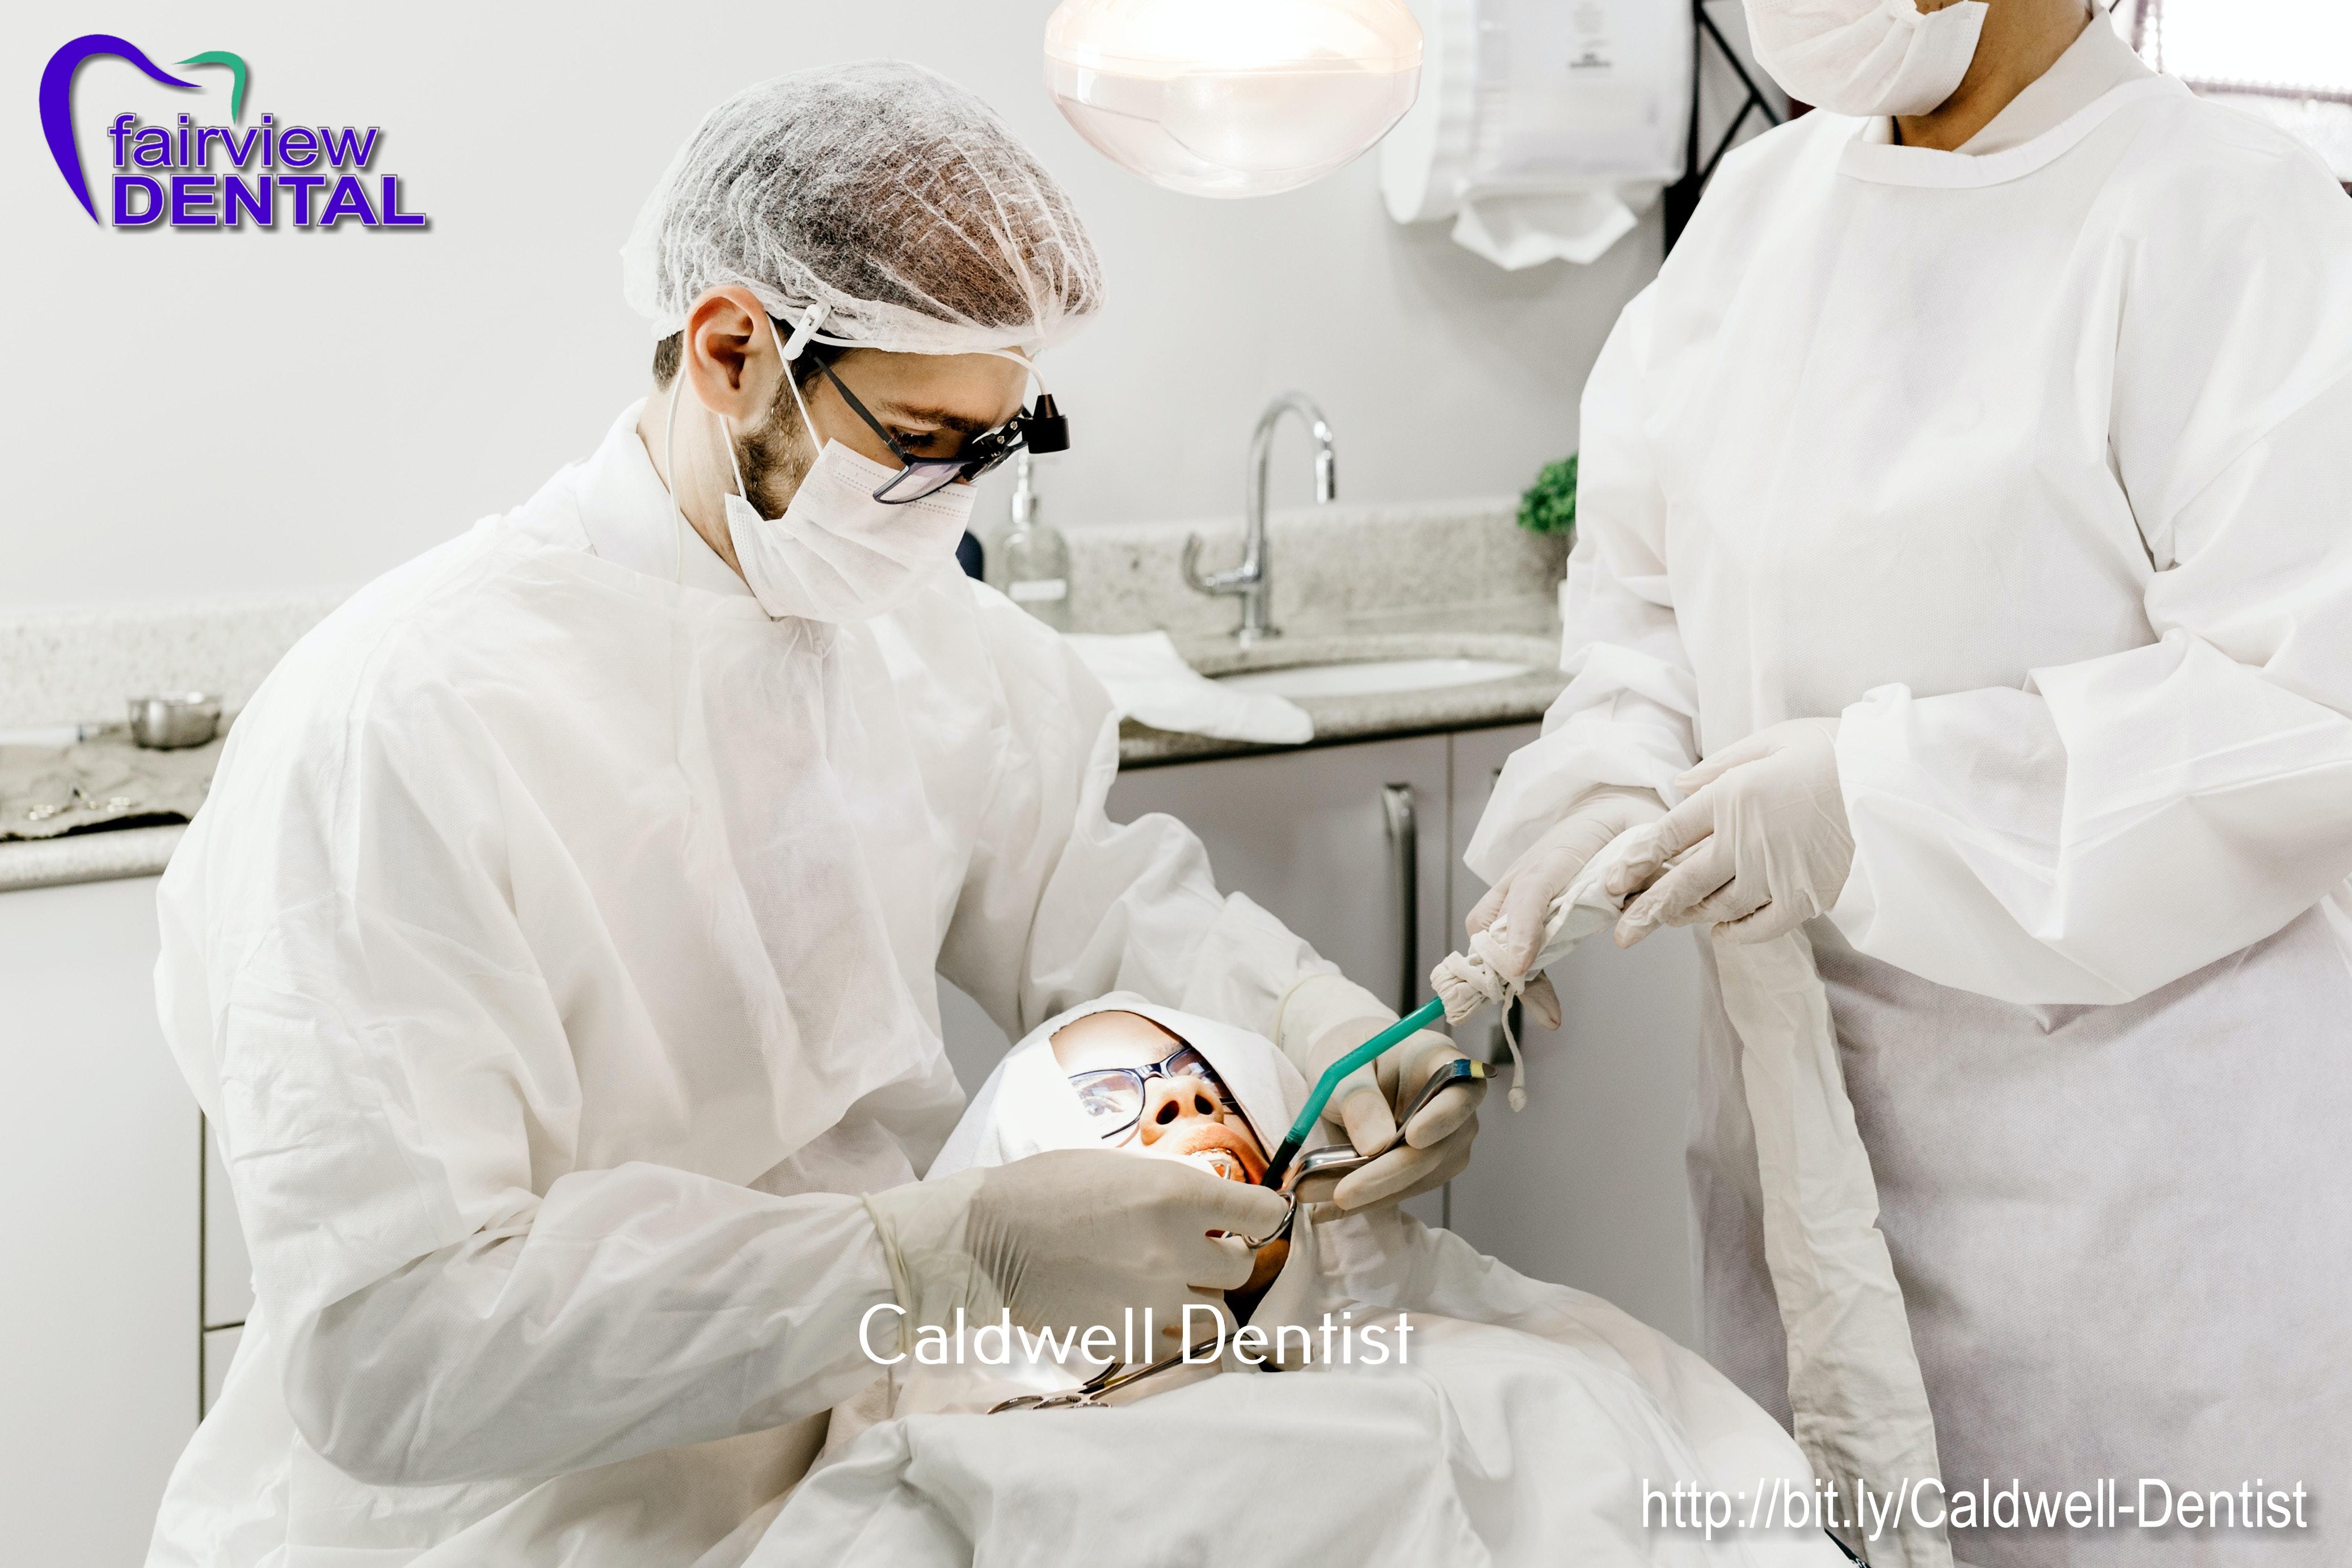 Fairview Dental Parades Their Technology